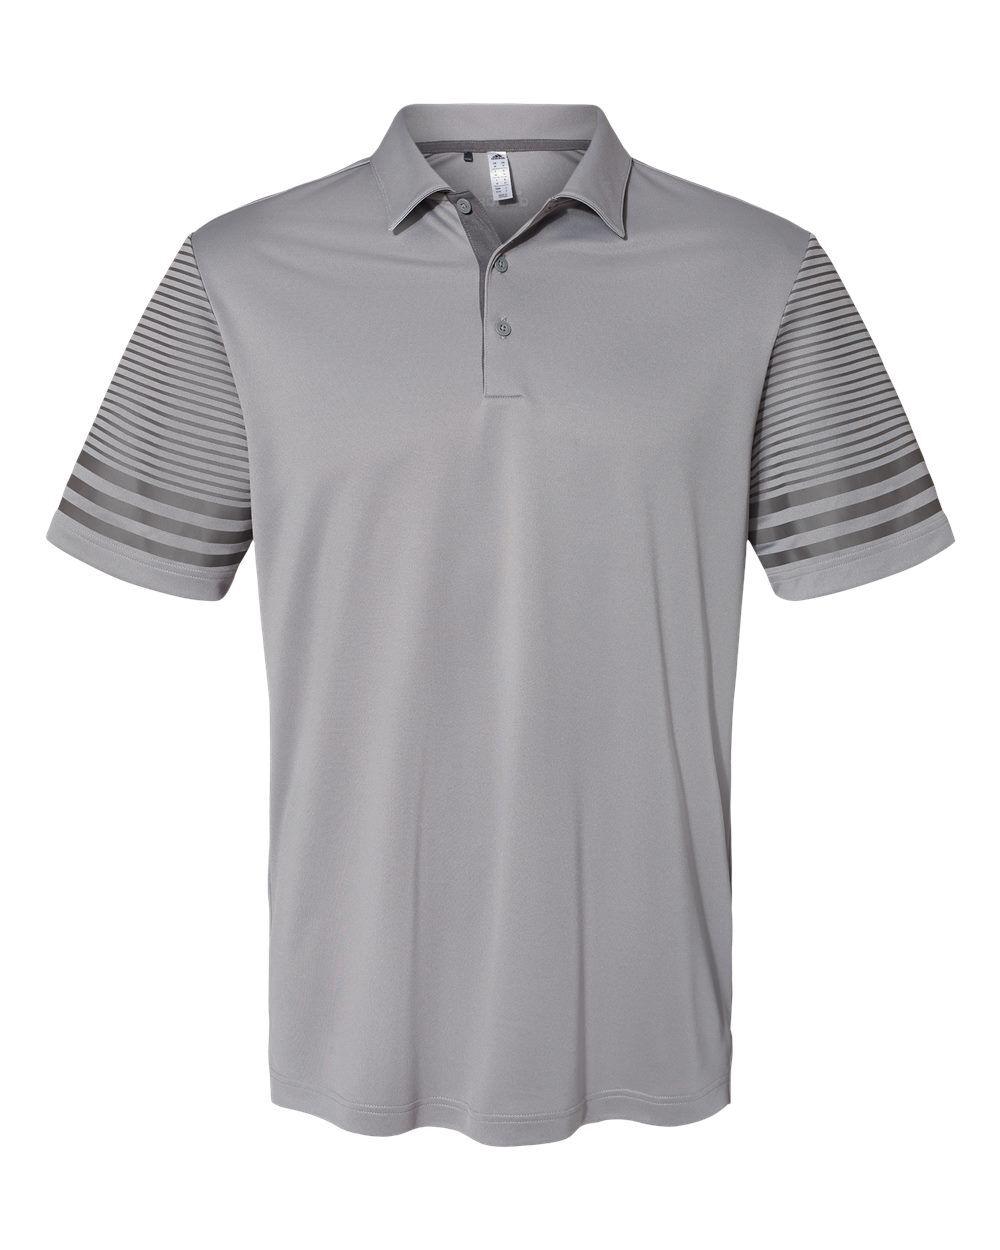 Adidas - Striped Sleeve Sport Shirt - A490 - Grey Three/ Grey Five - 3X-Large